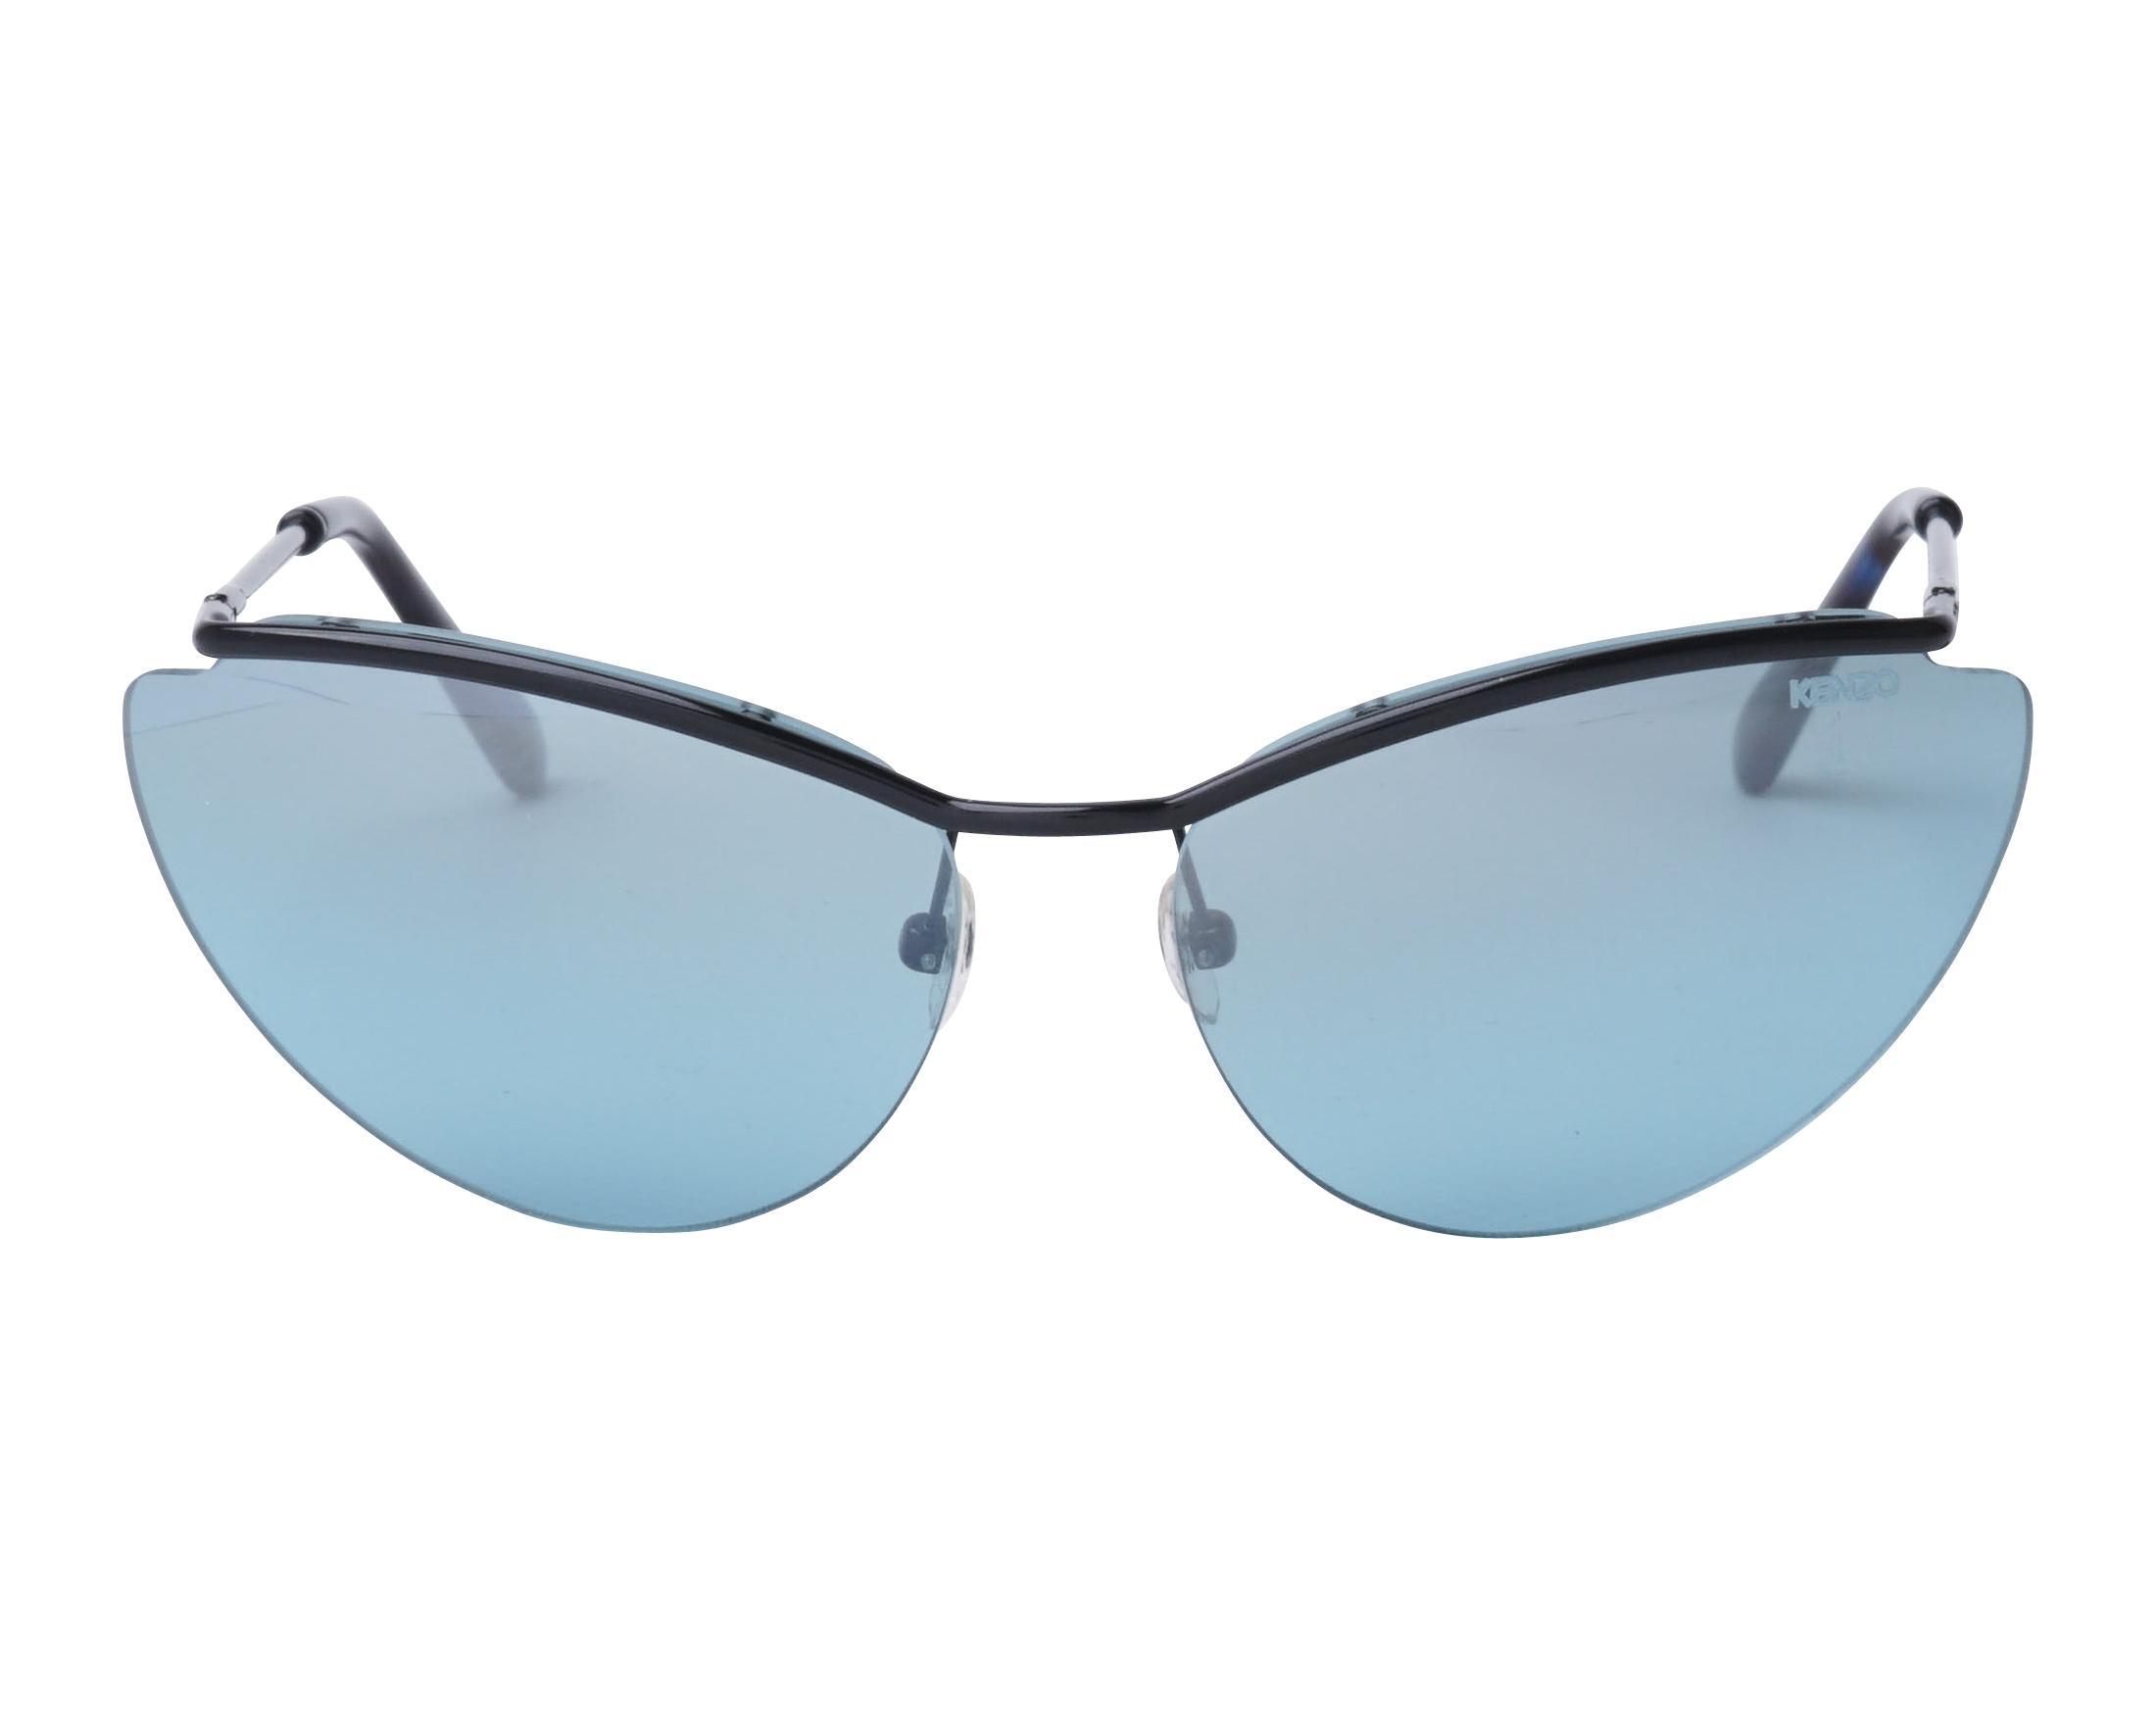 303320b3979 Sunglasses Kenzo KZ-3171 C01 61-16 Black front view